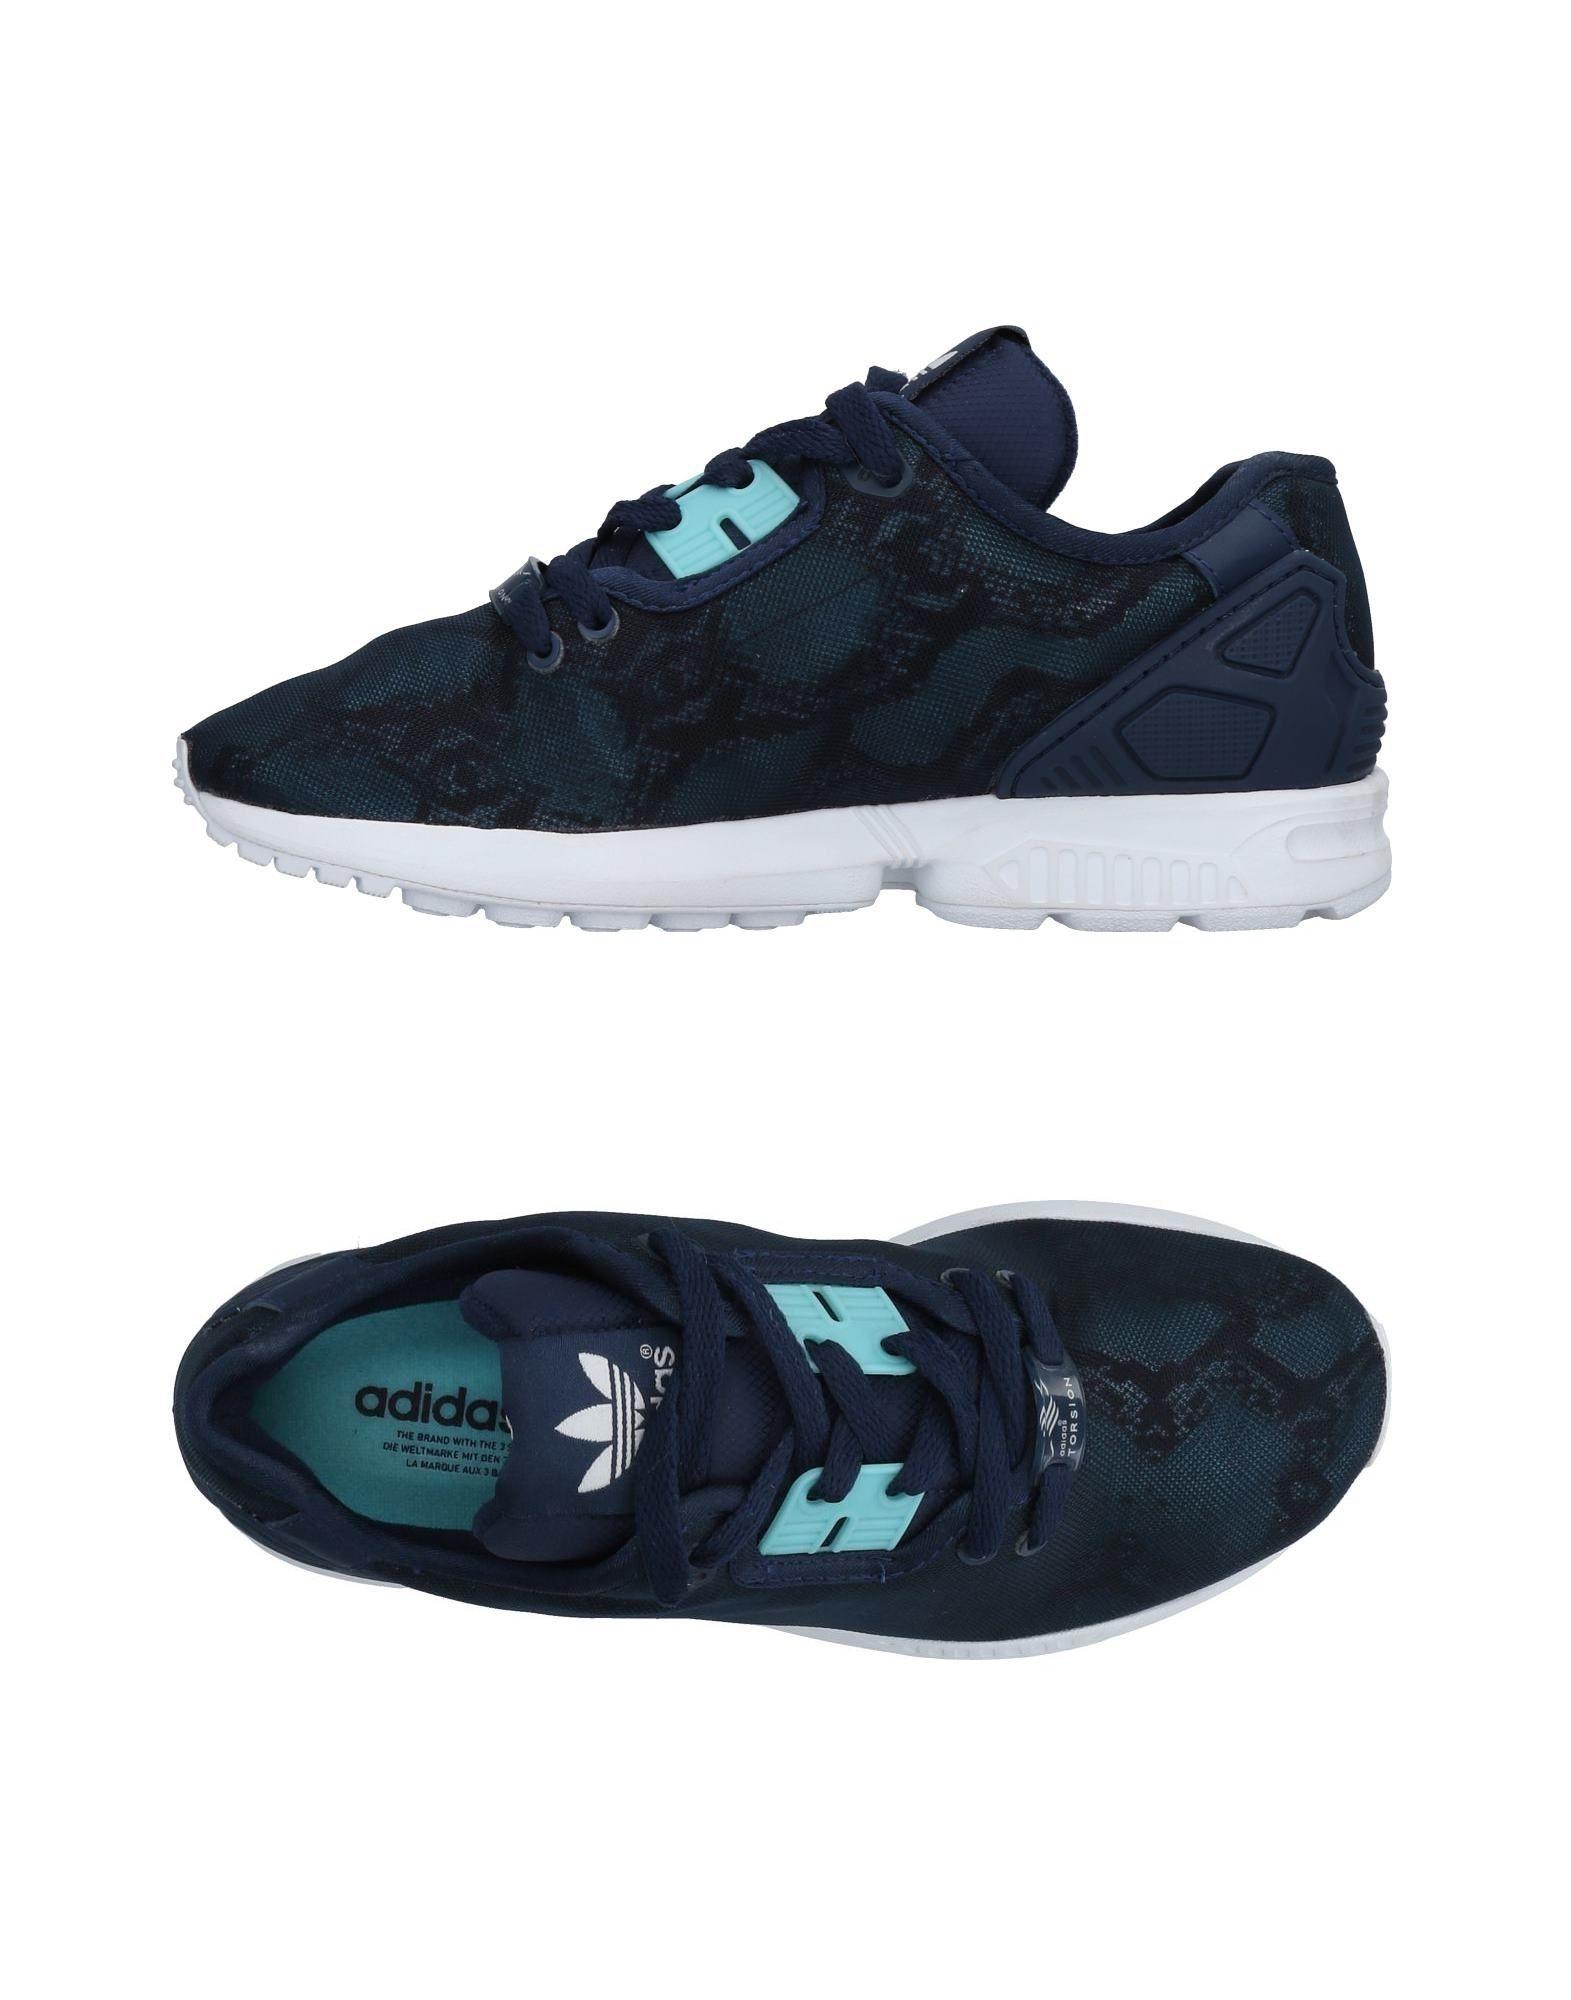 Adidas Originals Originals Originals Sneakers - Women Adidas Originals Sneakers online on  Canada - 11486370OL 387dae